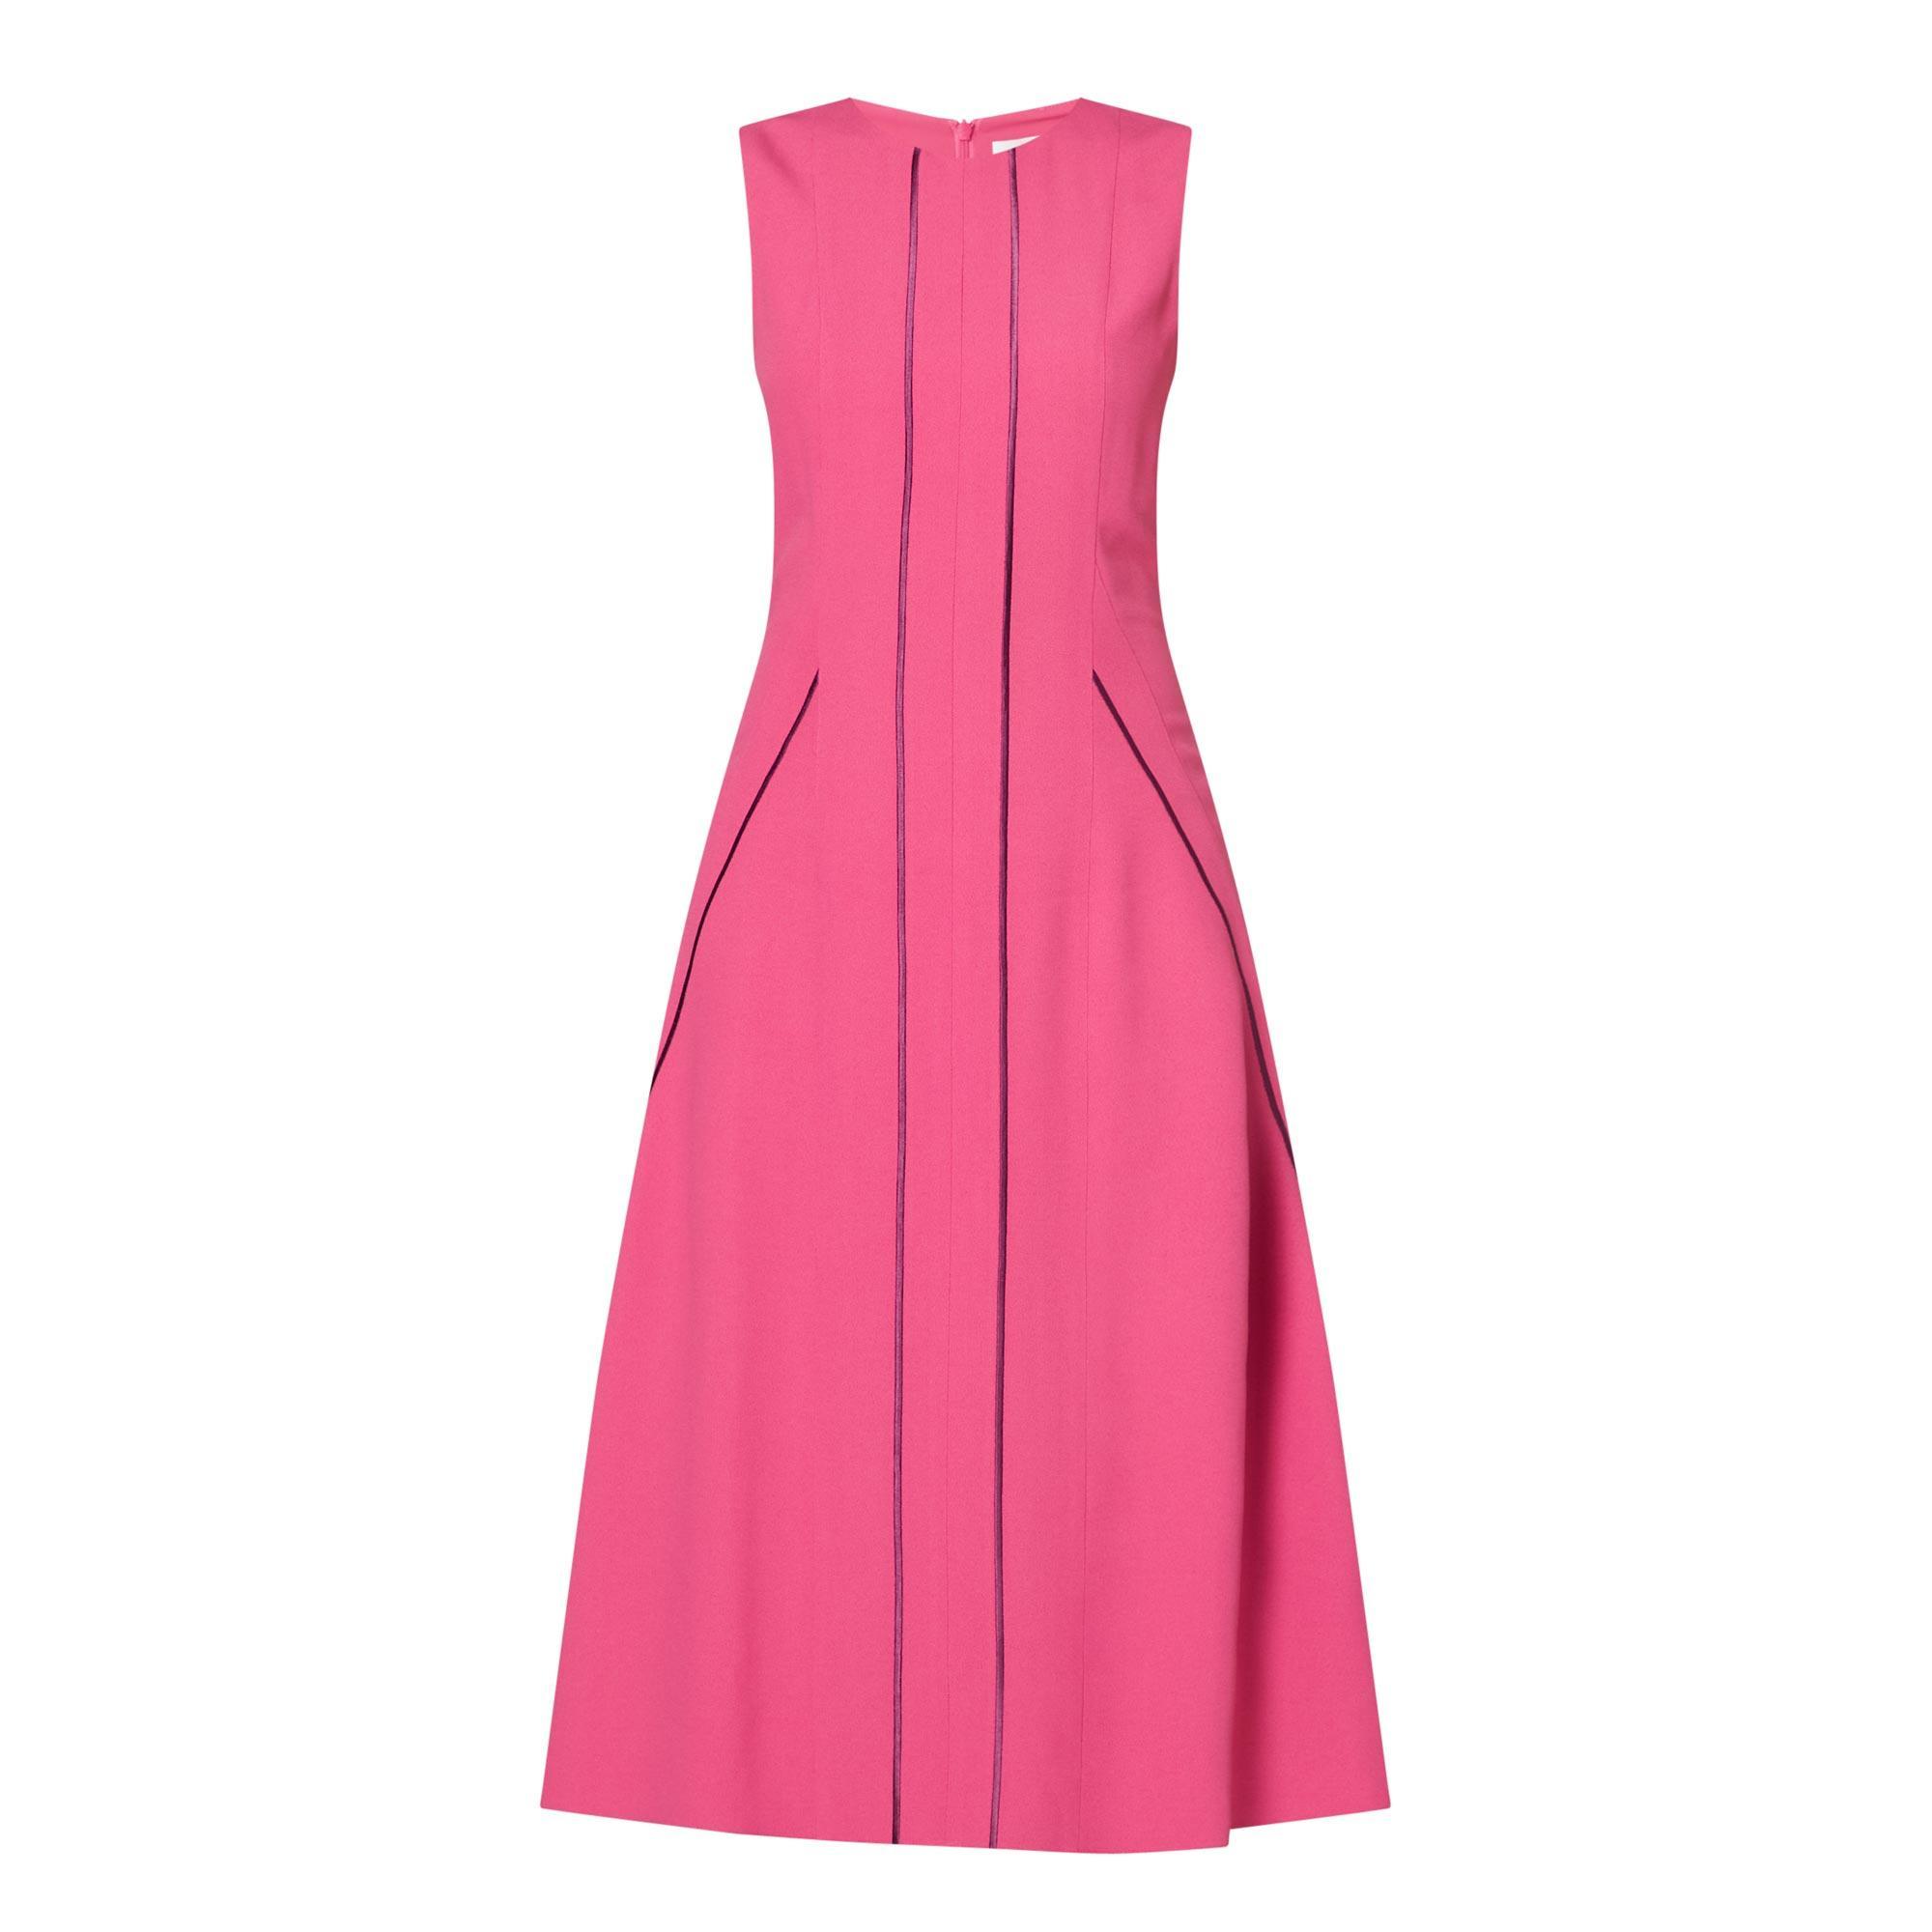 Dimasia Midi Dress